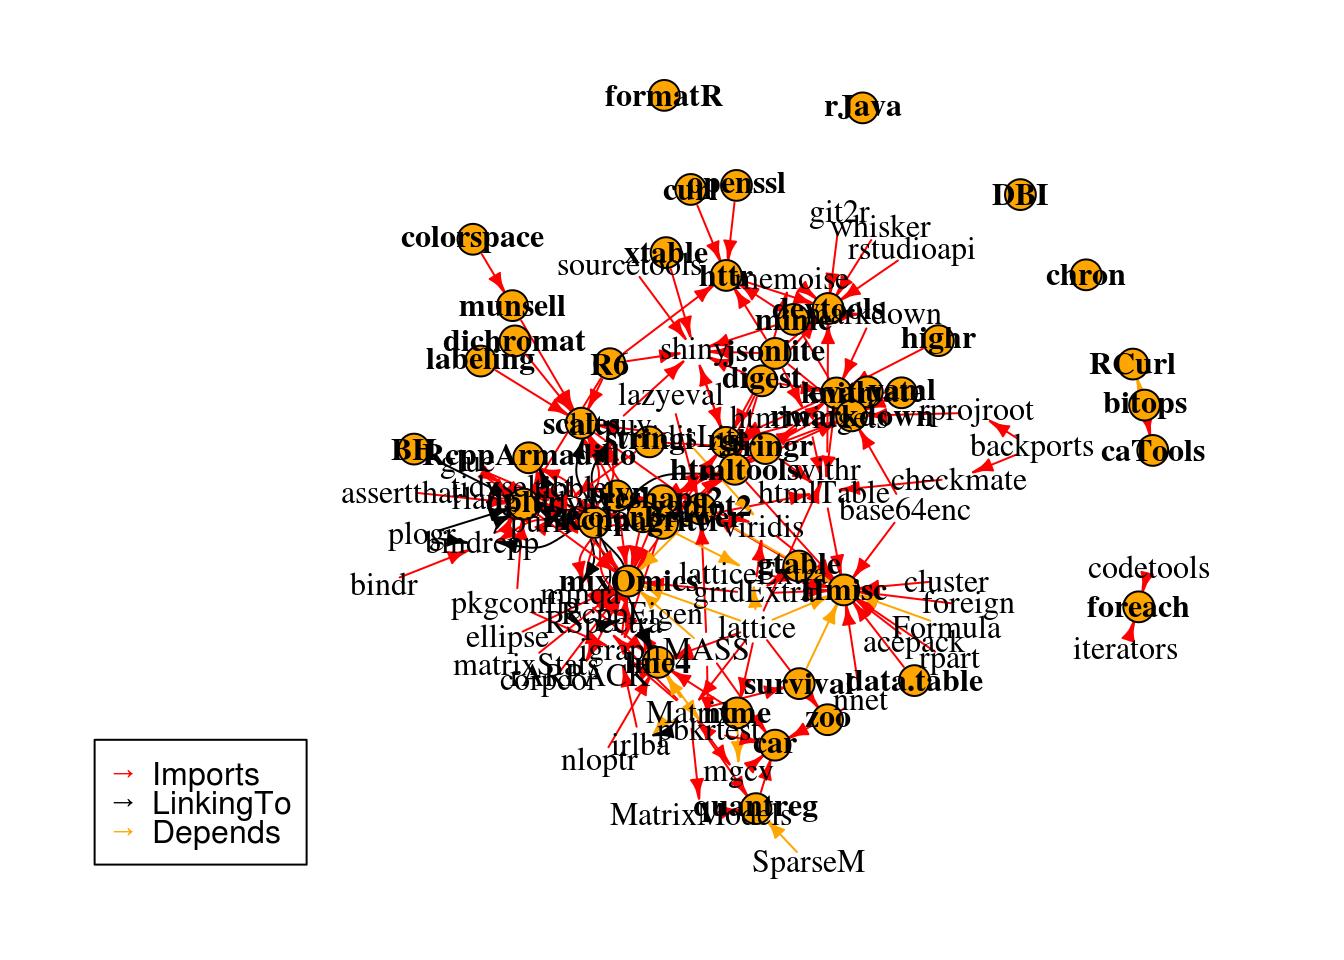 Meta-análise R (2): Analisando Pacotes R como indivíduos em